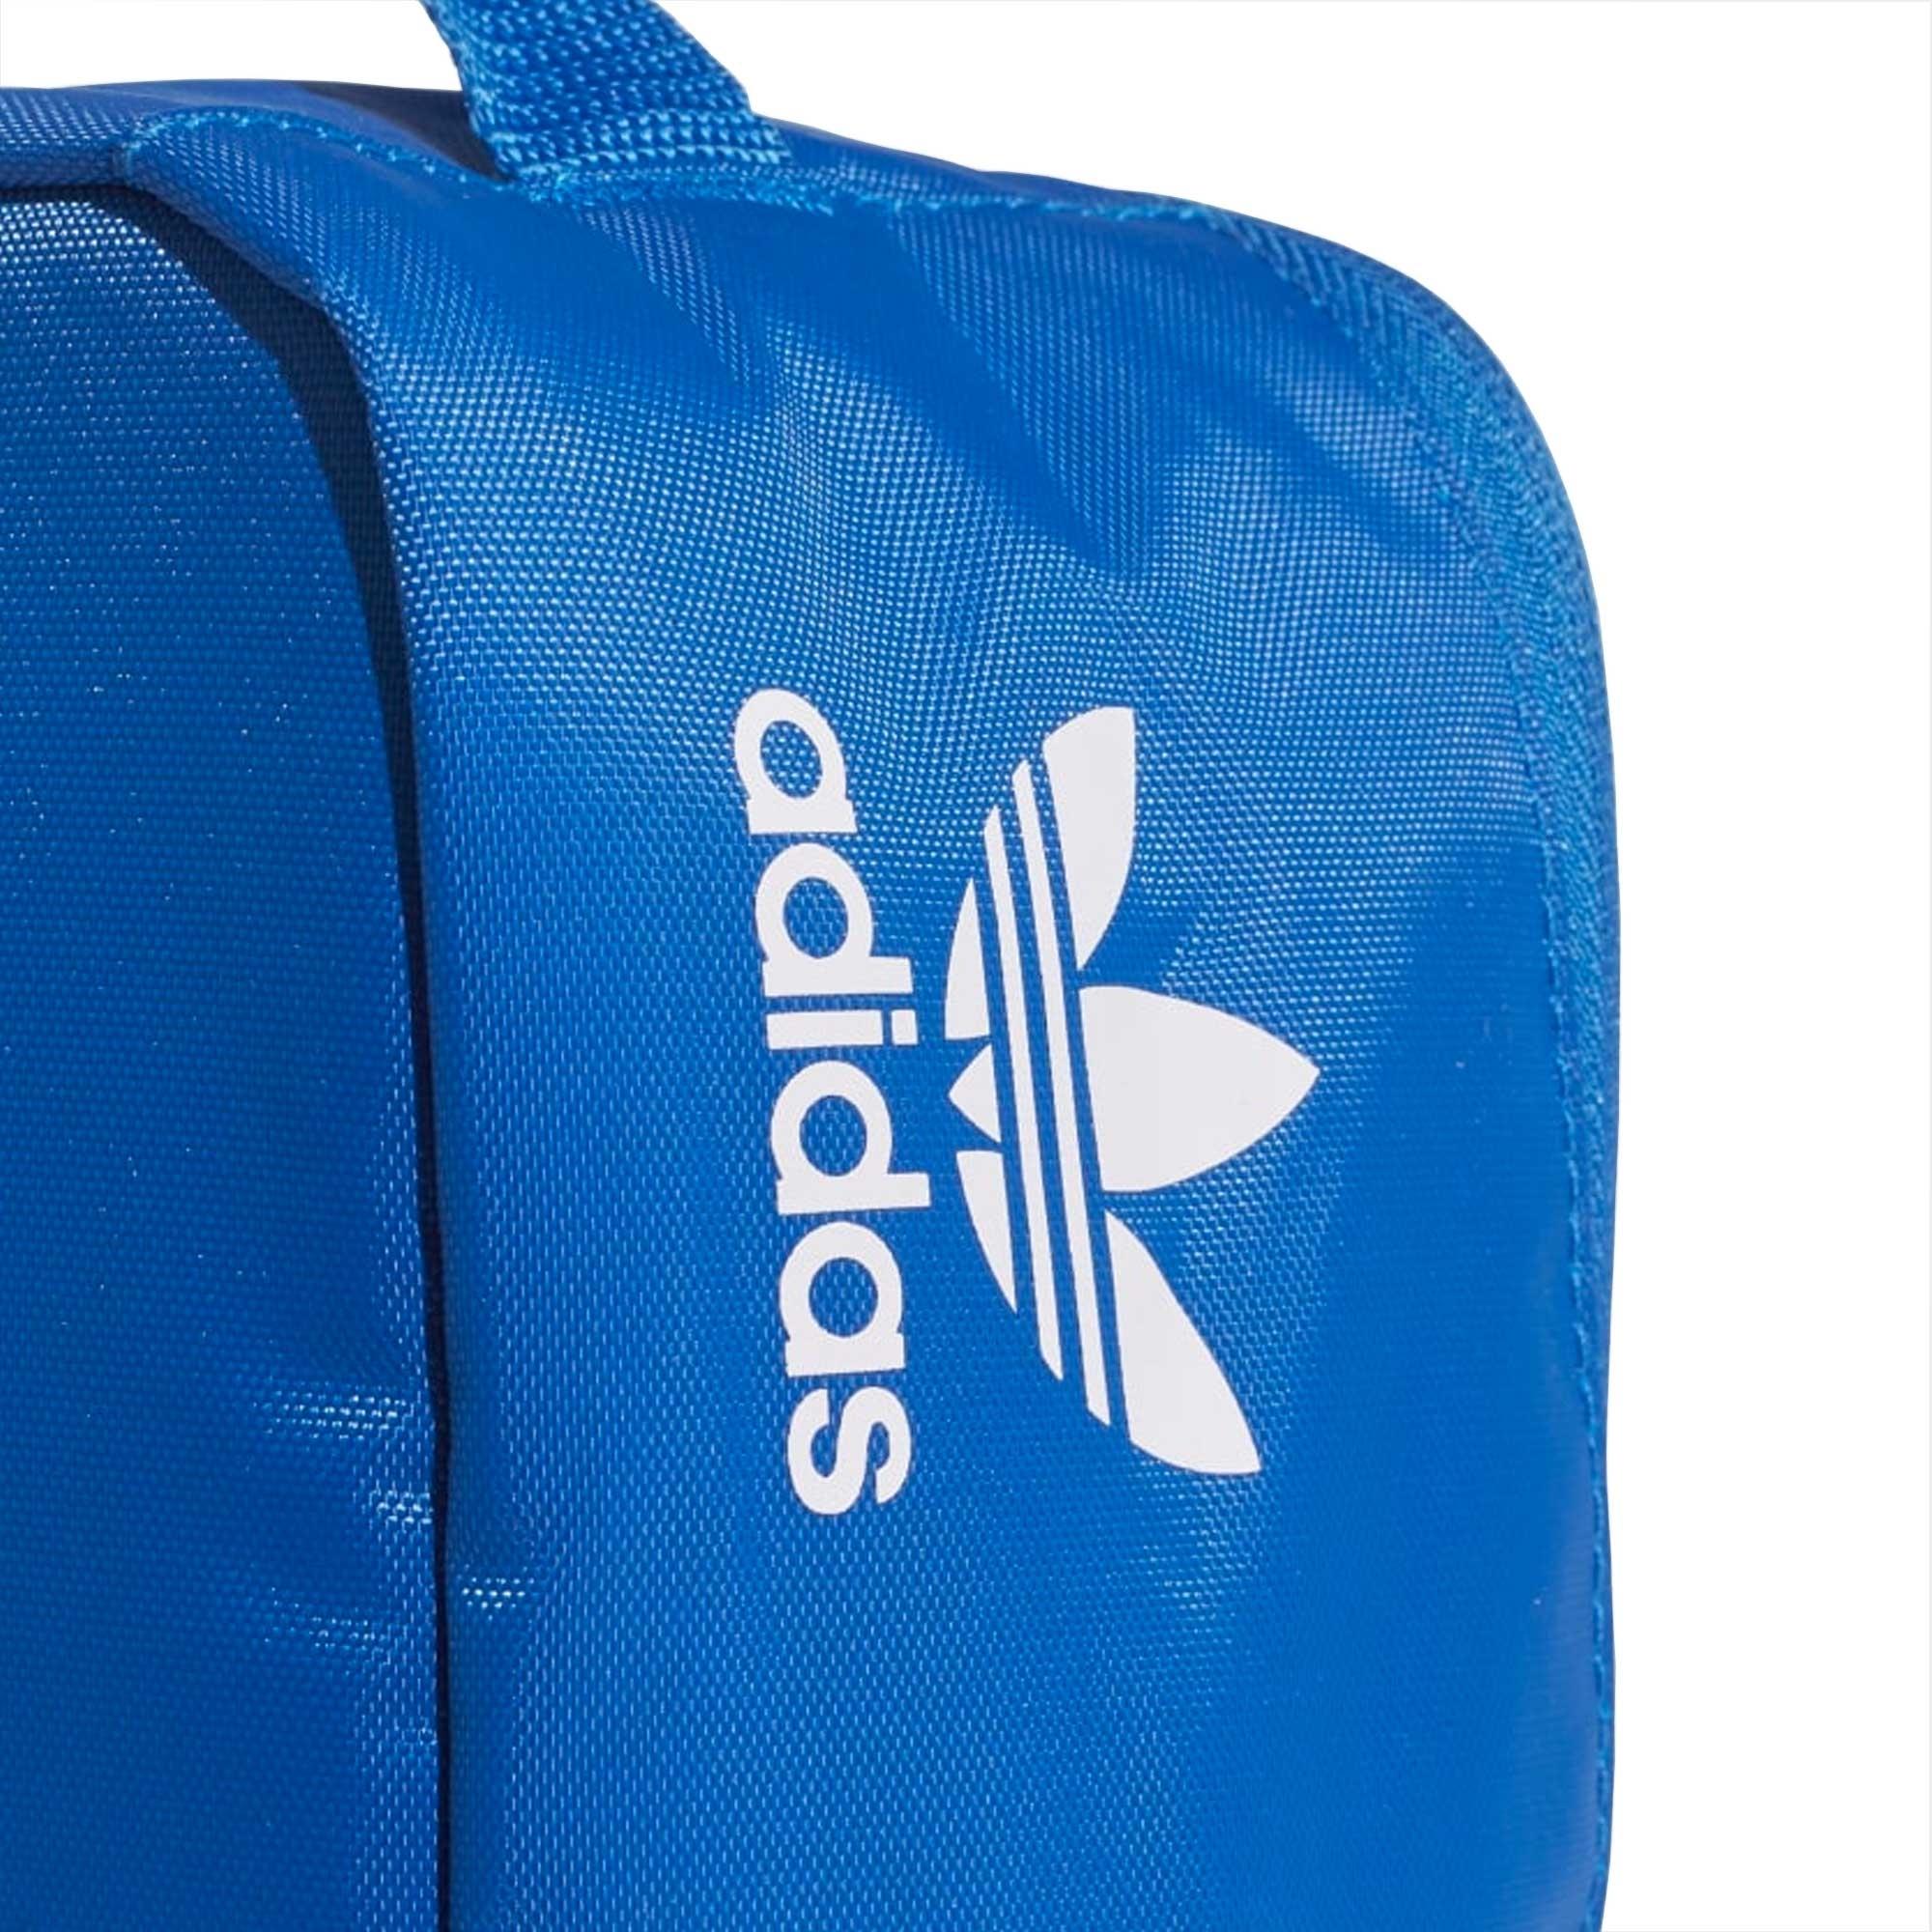 Adidas Originals Sneaker Bag - Blue Bird